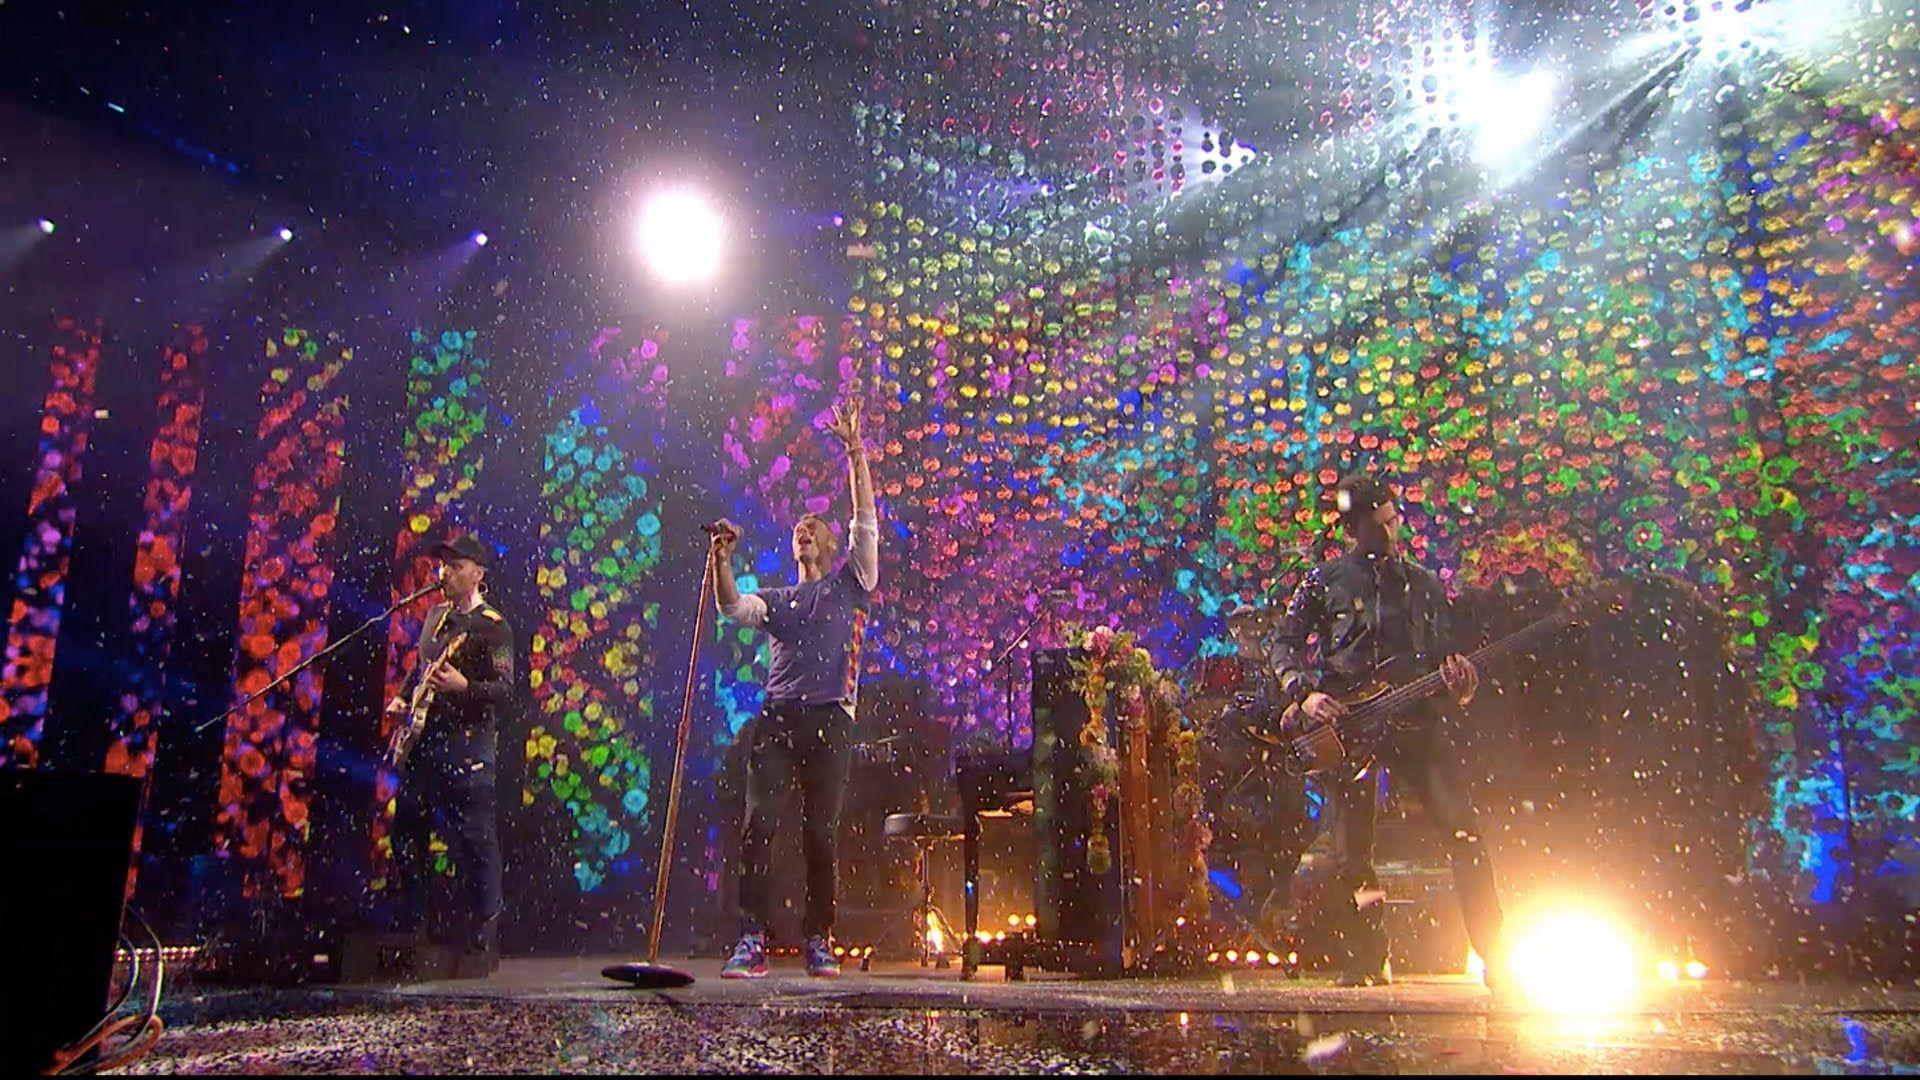 Coldplay Hymn For The Weekend Live At The Britawards 2016 Https Youtu Be Jgimek19jm